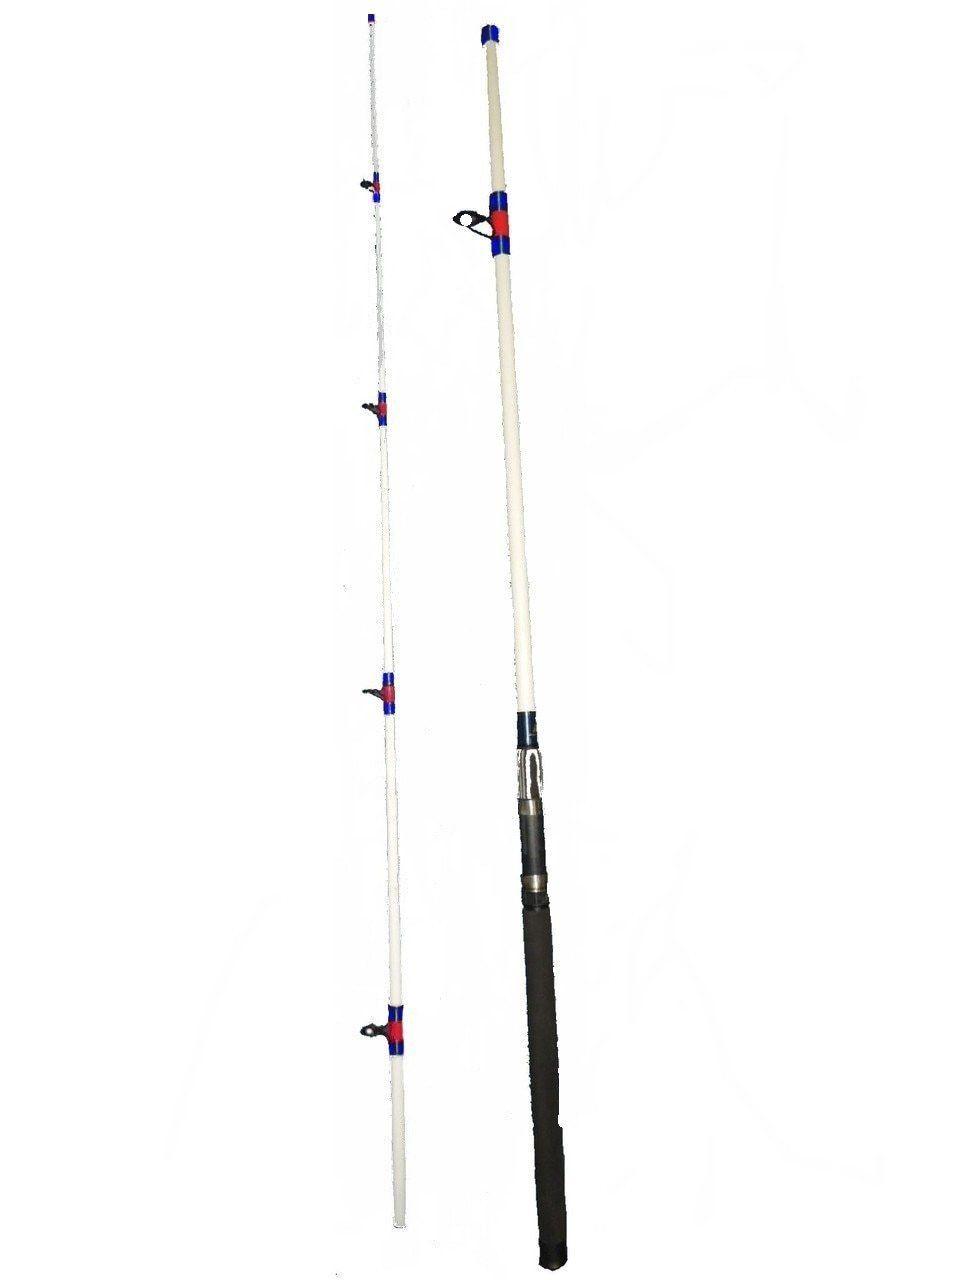 15-30 lb  10 ft  Surf Rod - 2pc  Saltwater Fishing -